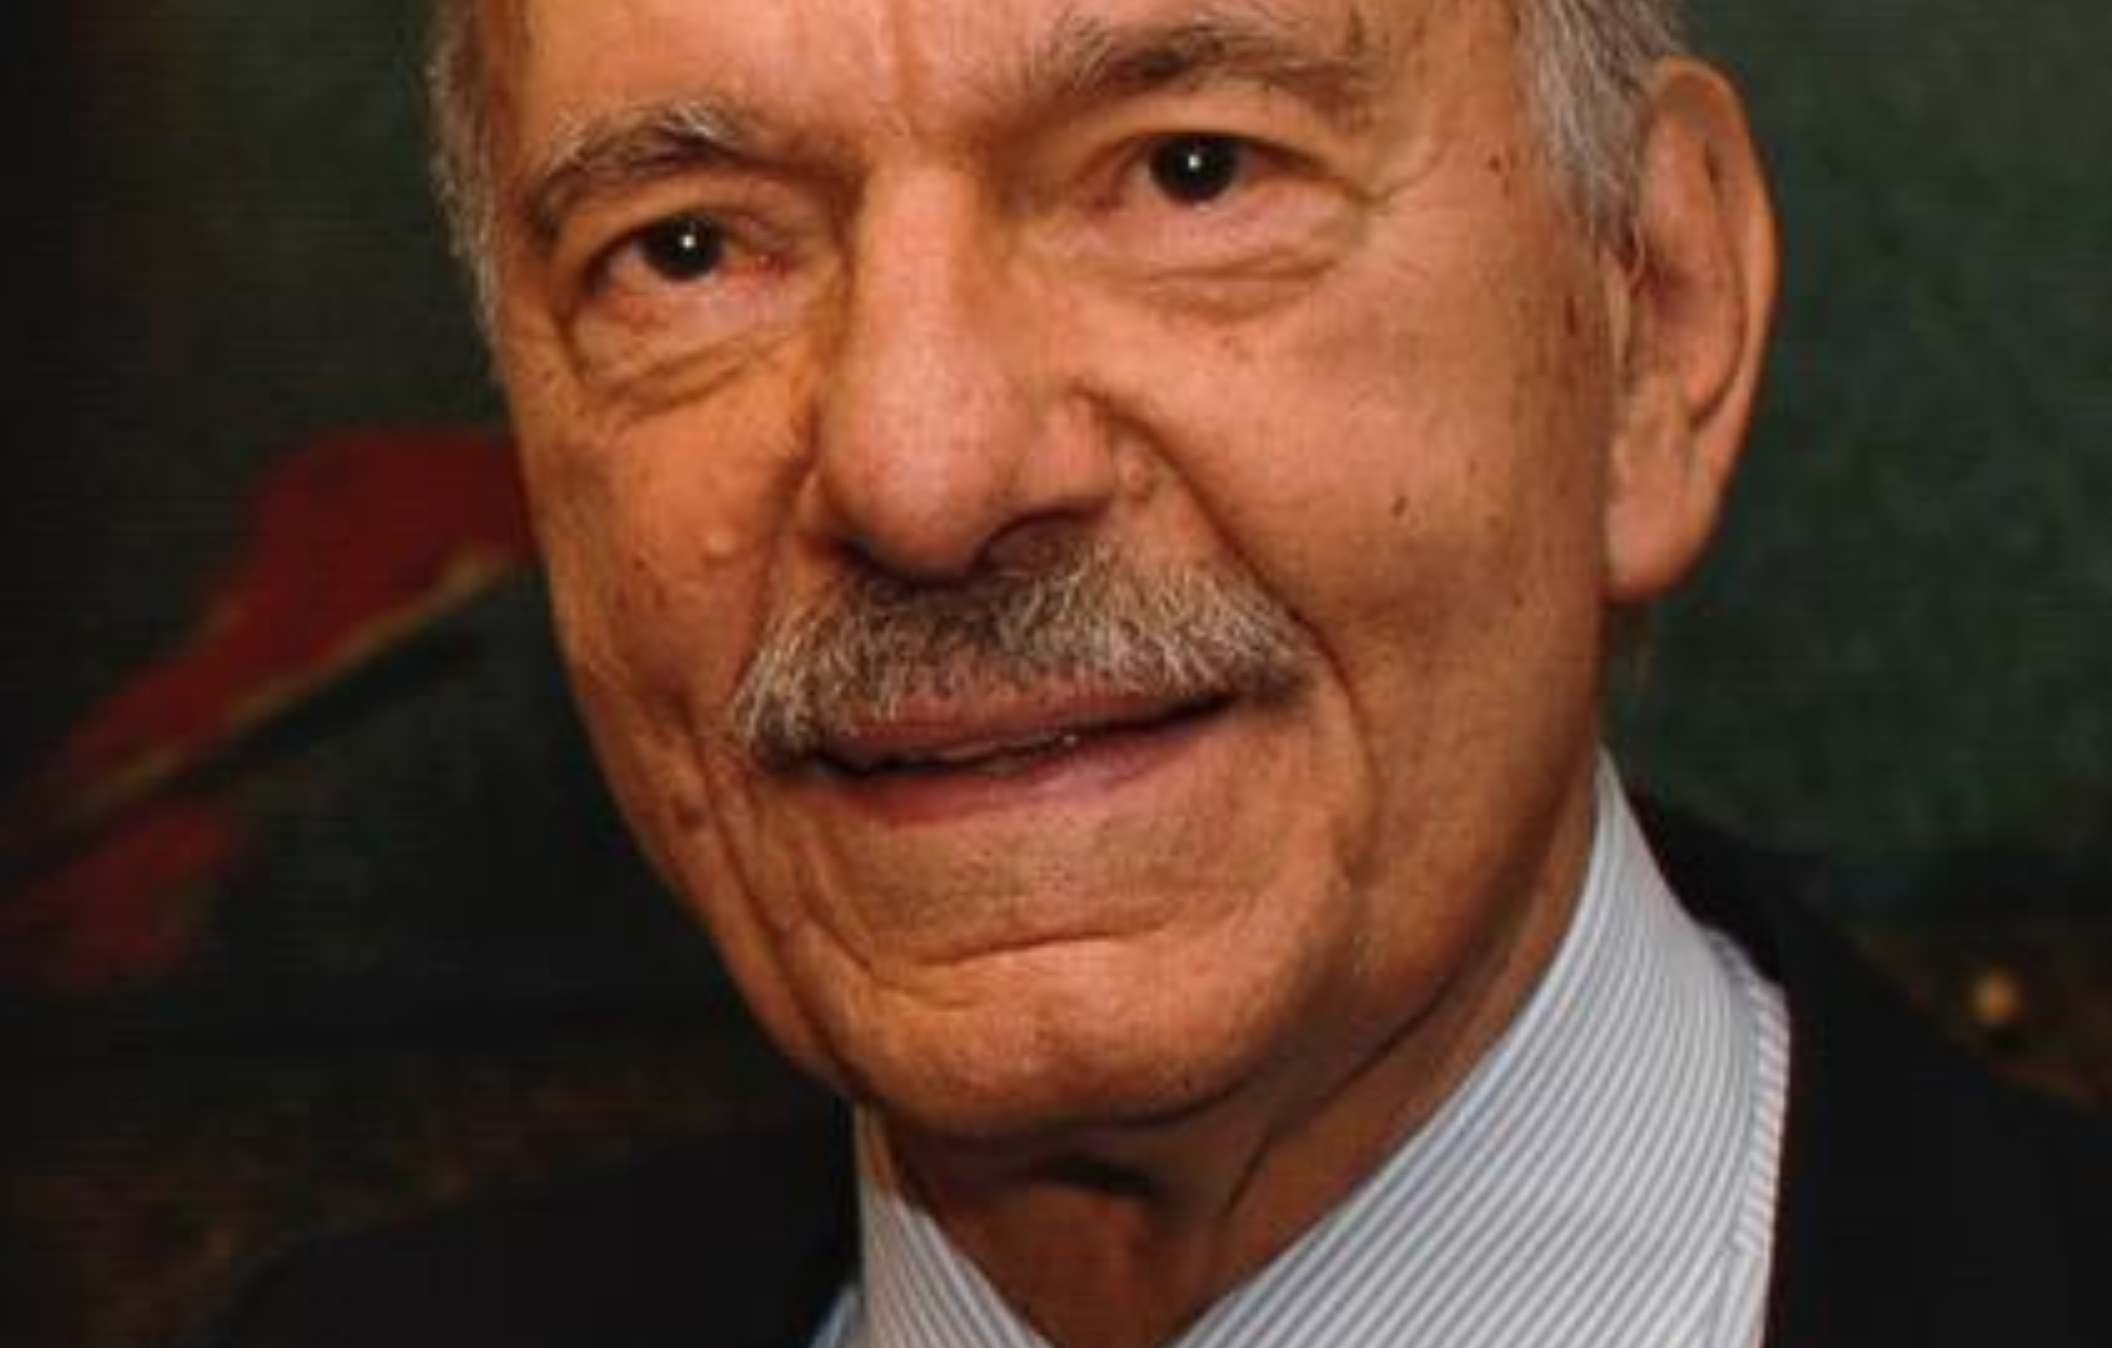 Ovidio Jacorossi